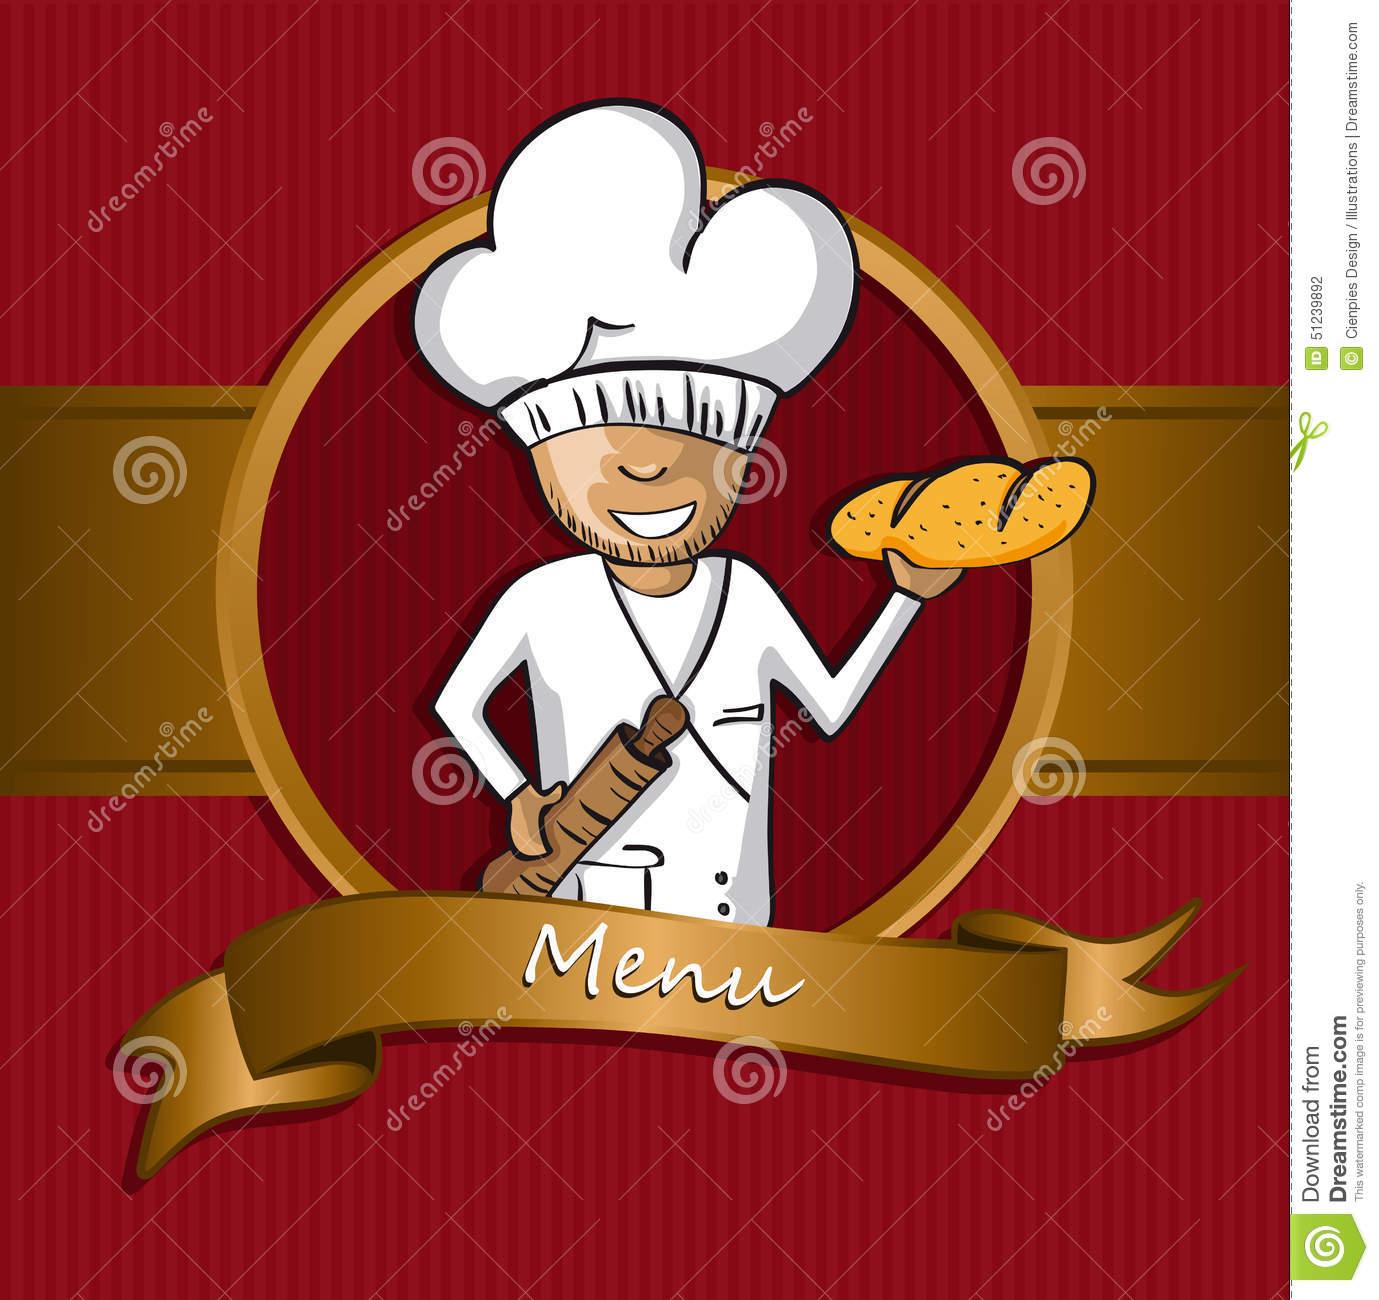 Baker Chef Cartoon Badge Menu Design Stock Vector.